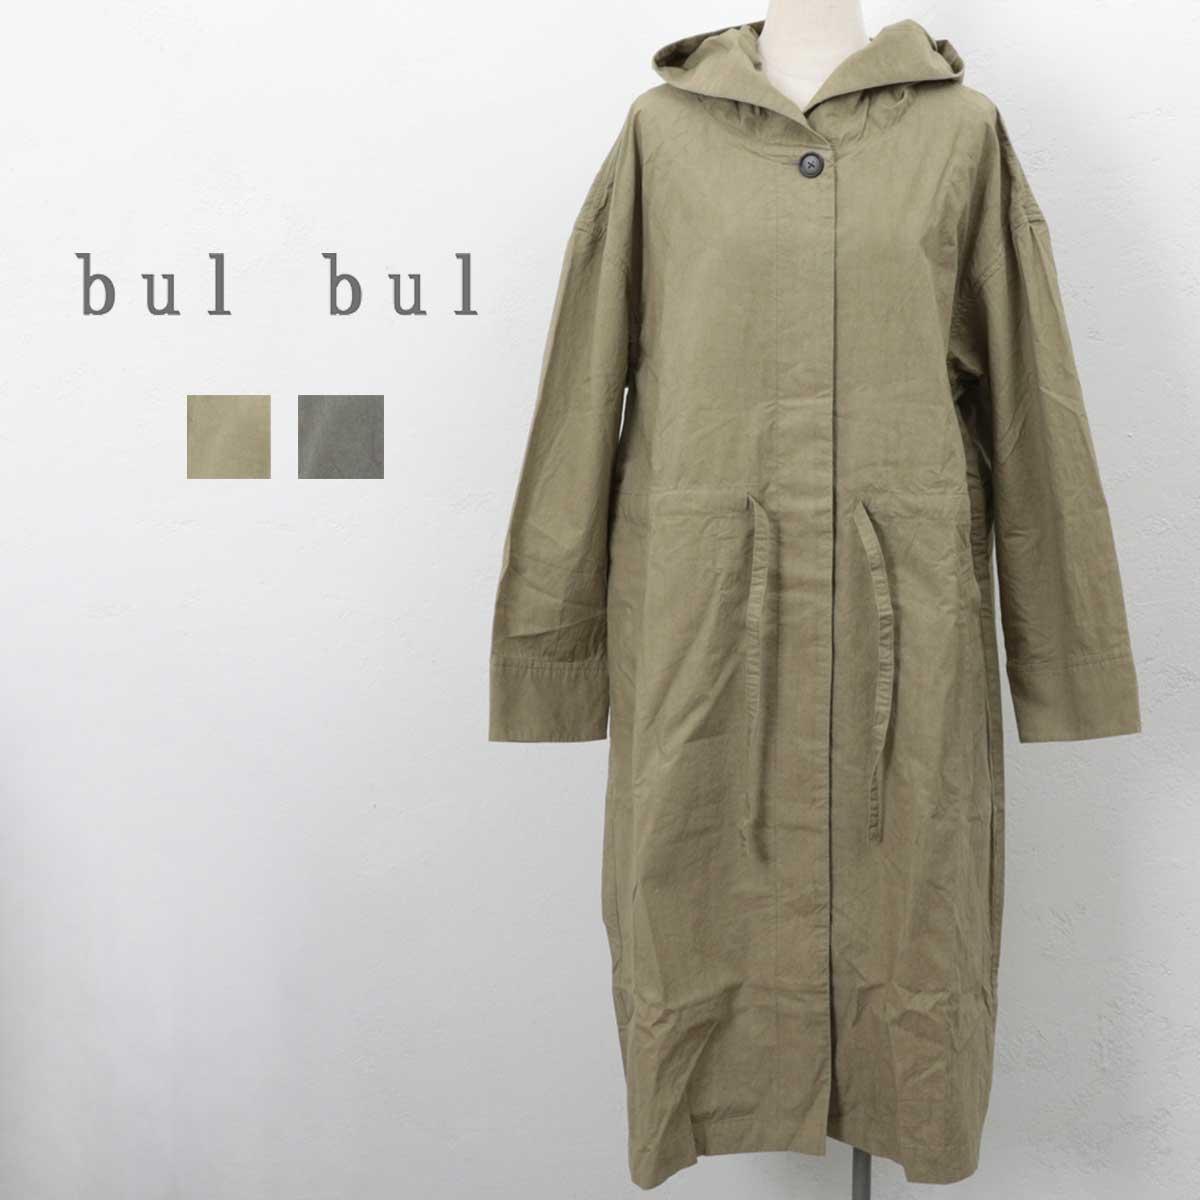 bul bul バルバル コート 硫化染め コットンダンプ フードロングコート